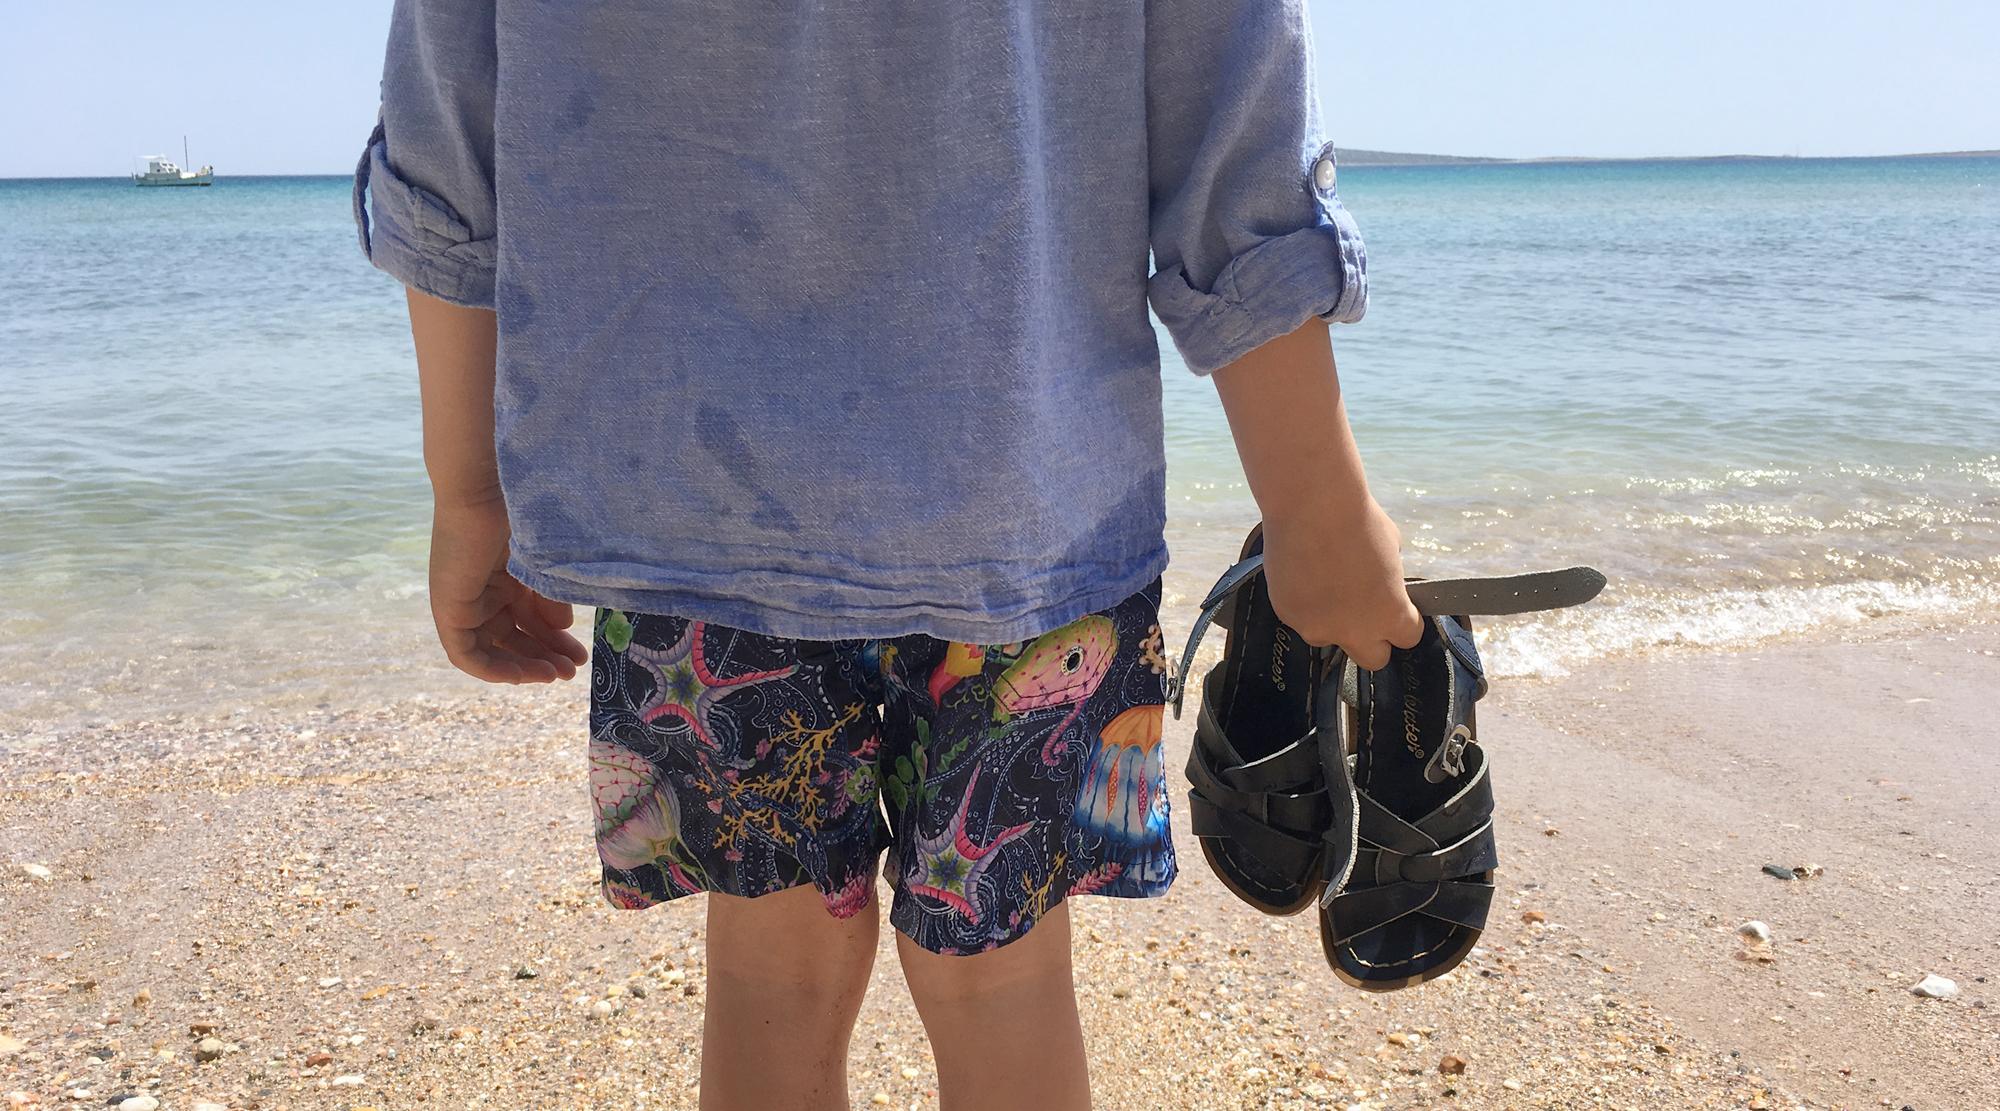 Sommerschuhe für Jungs - Sandalen Meer